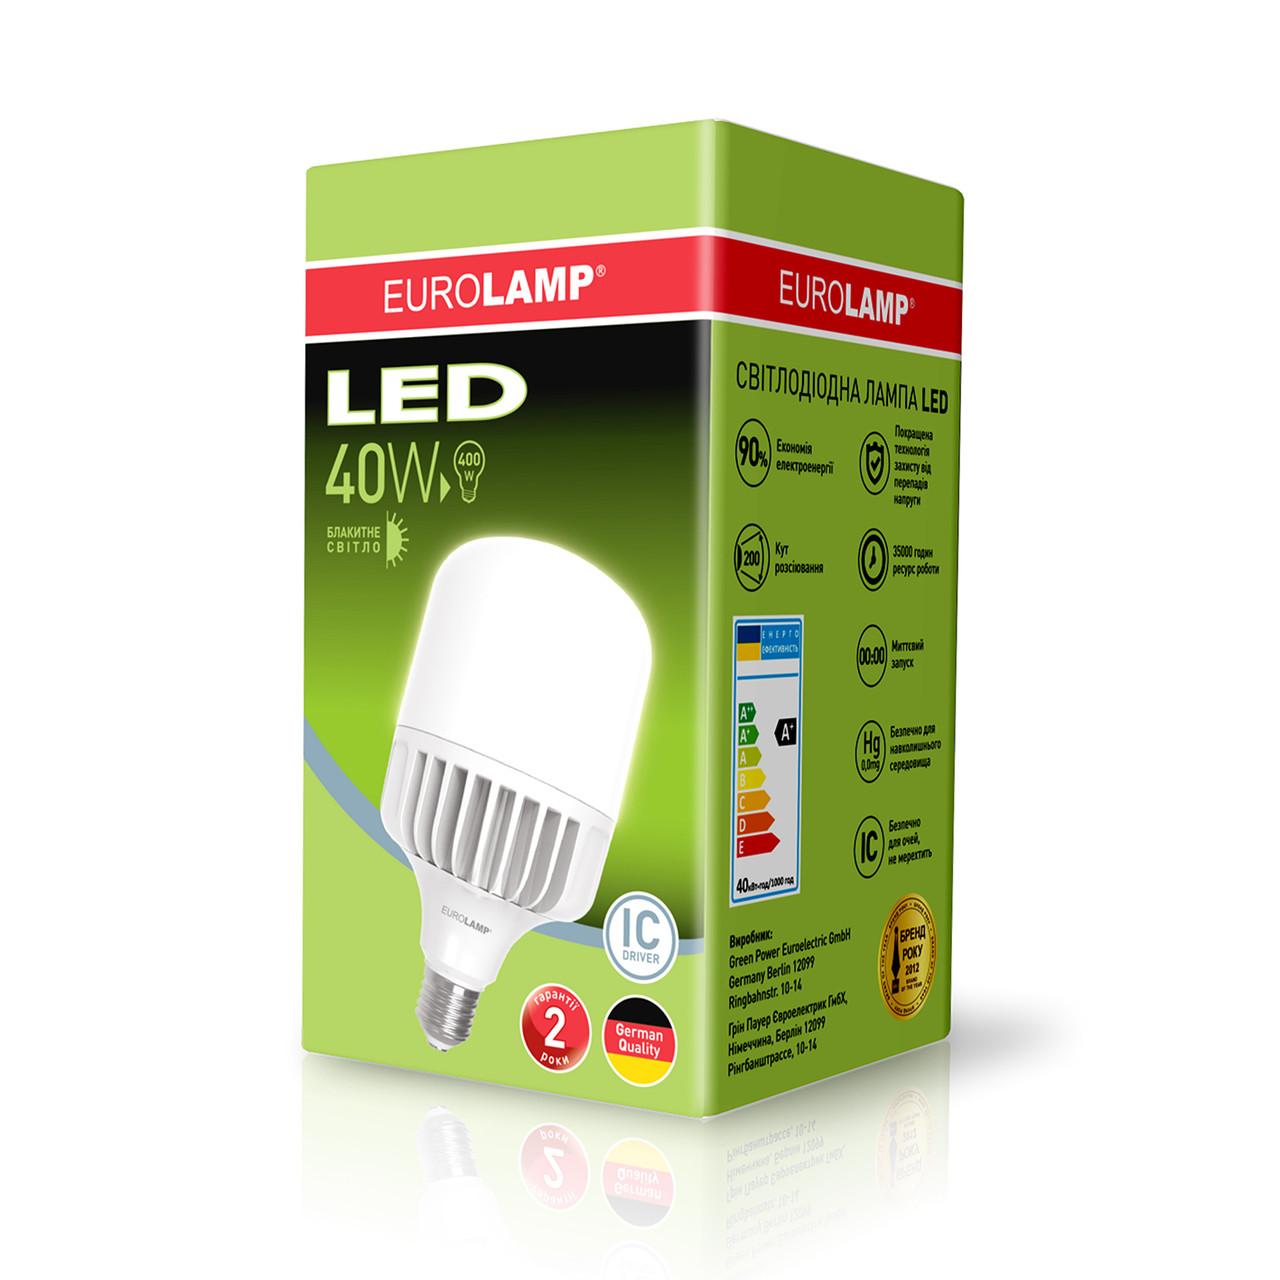 Высокомощная led-лампа Eurolamp LED 40W E27/Е40 4100Lm Ra85(LED-HP-40276)